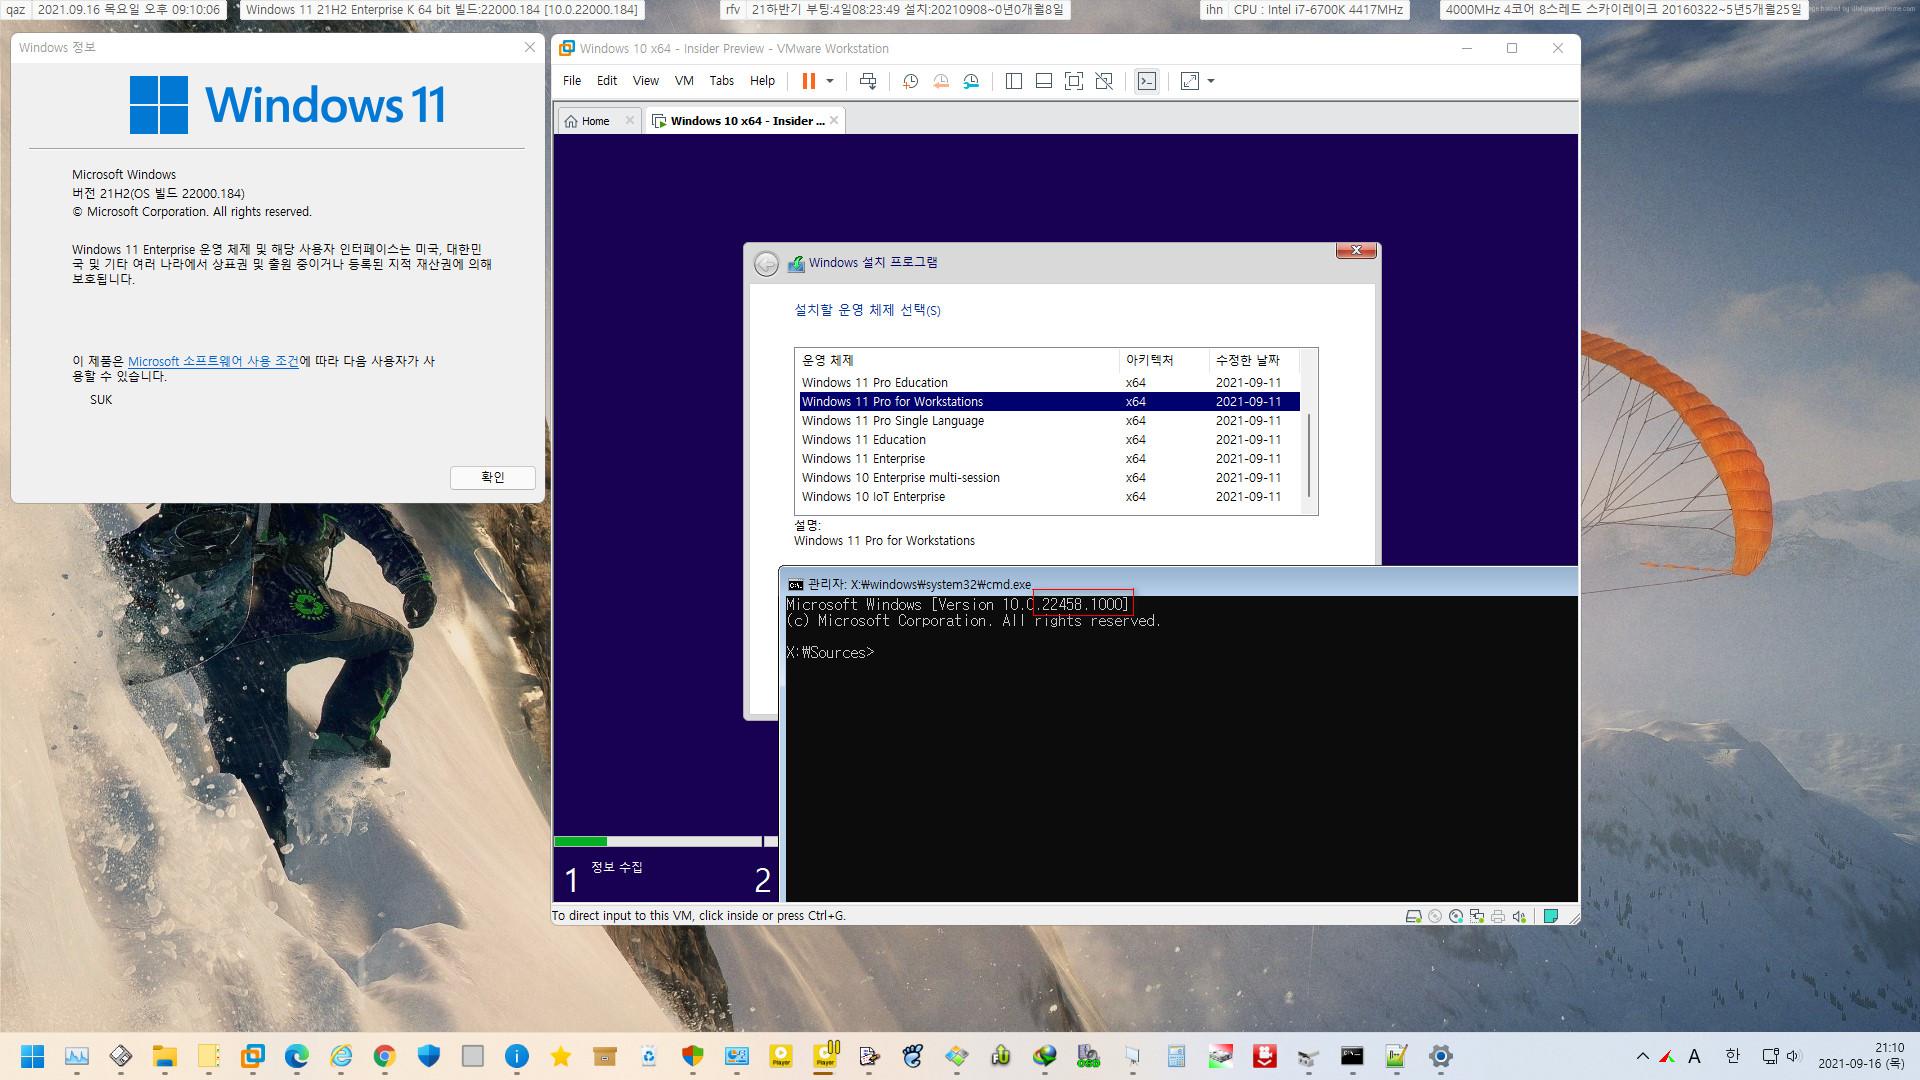 Windows 11 인사이더 프리뷰 - 버전 Dev (OS 빌드 22458.1000) 나왔네요 - 개발자 채널 - 한글 UUP를 ISO로 만드는데 실패하여 윈도우 업데이트로 UUP 다운로드하여 ISO 만들었습니다. 한글 64비트 모든 에디션 + 우회  2021-09-16_211006.jpg